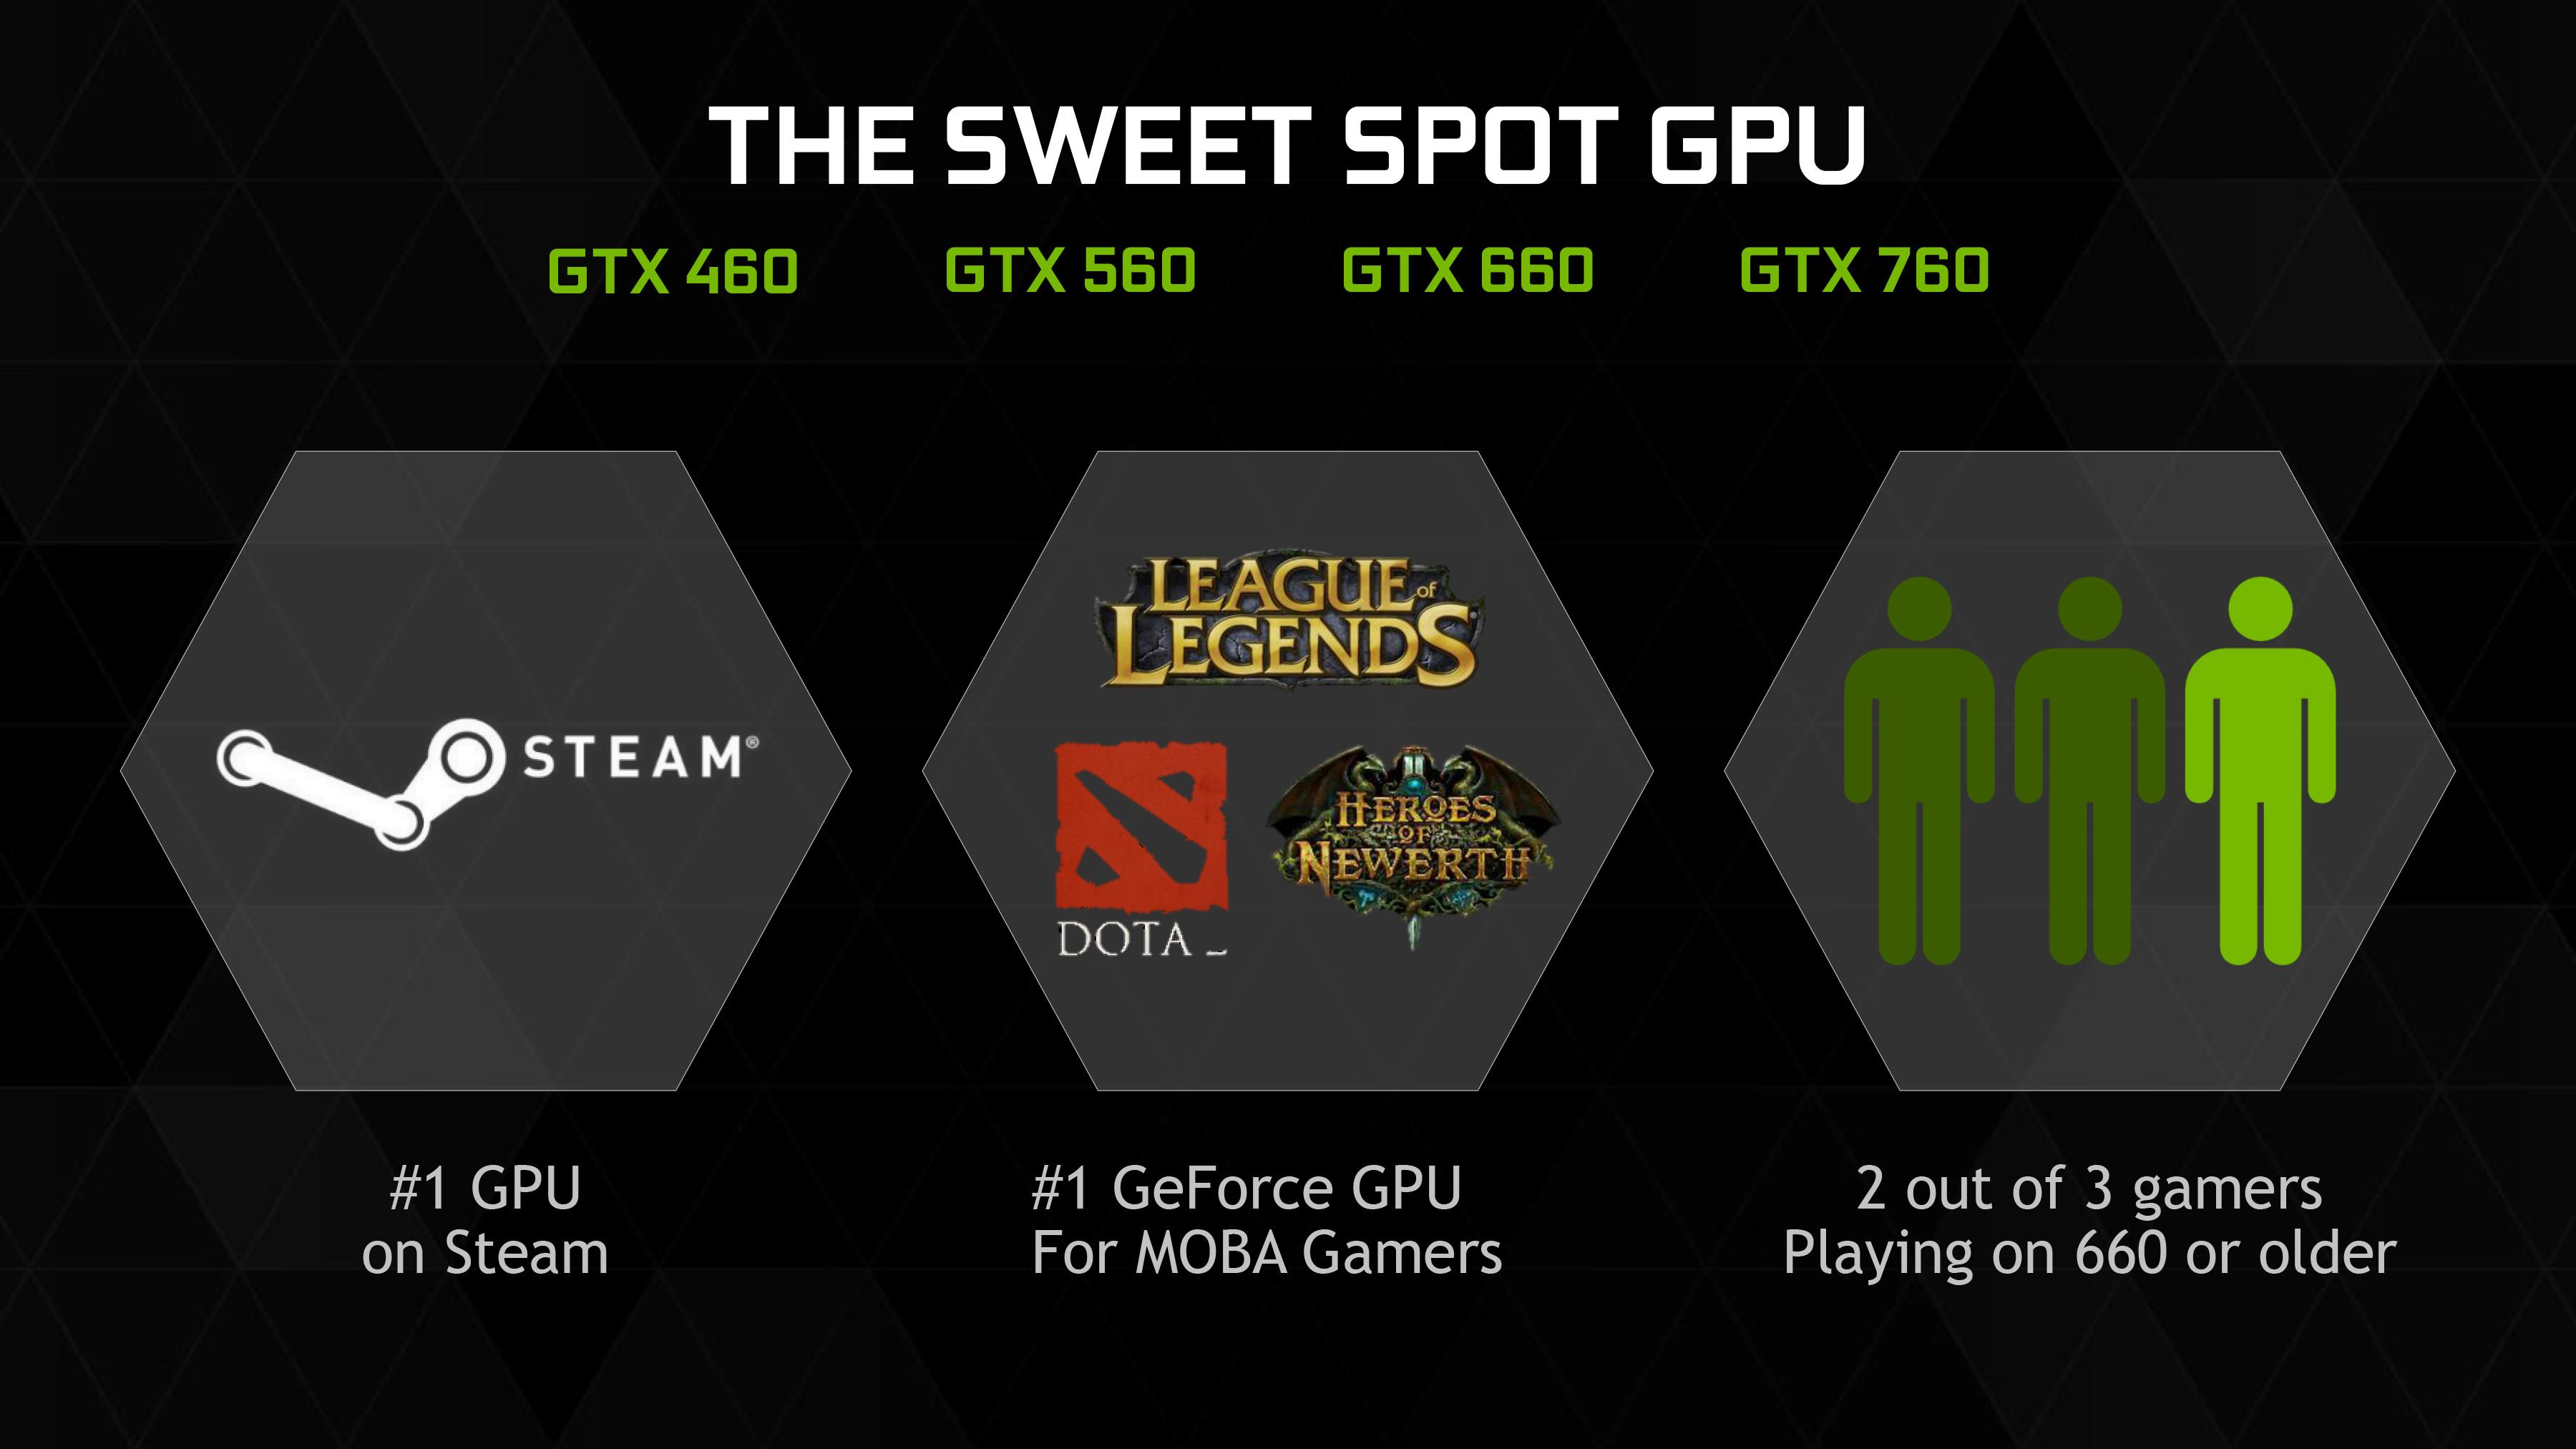 NVIDIA Launches GeForce GTX 960